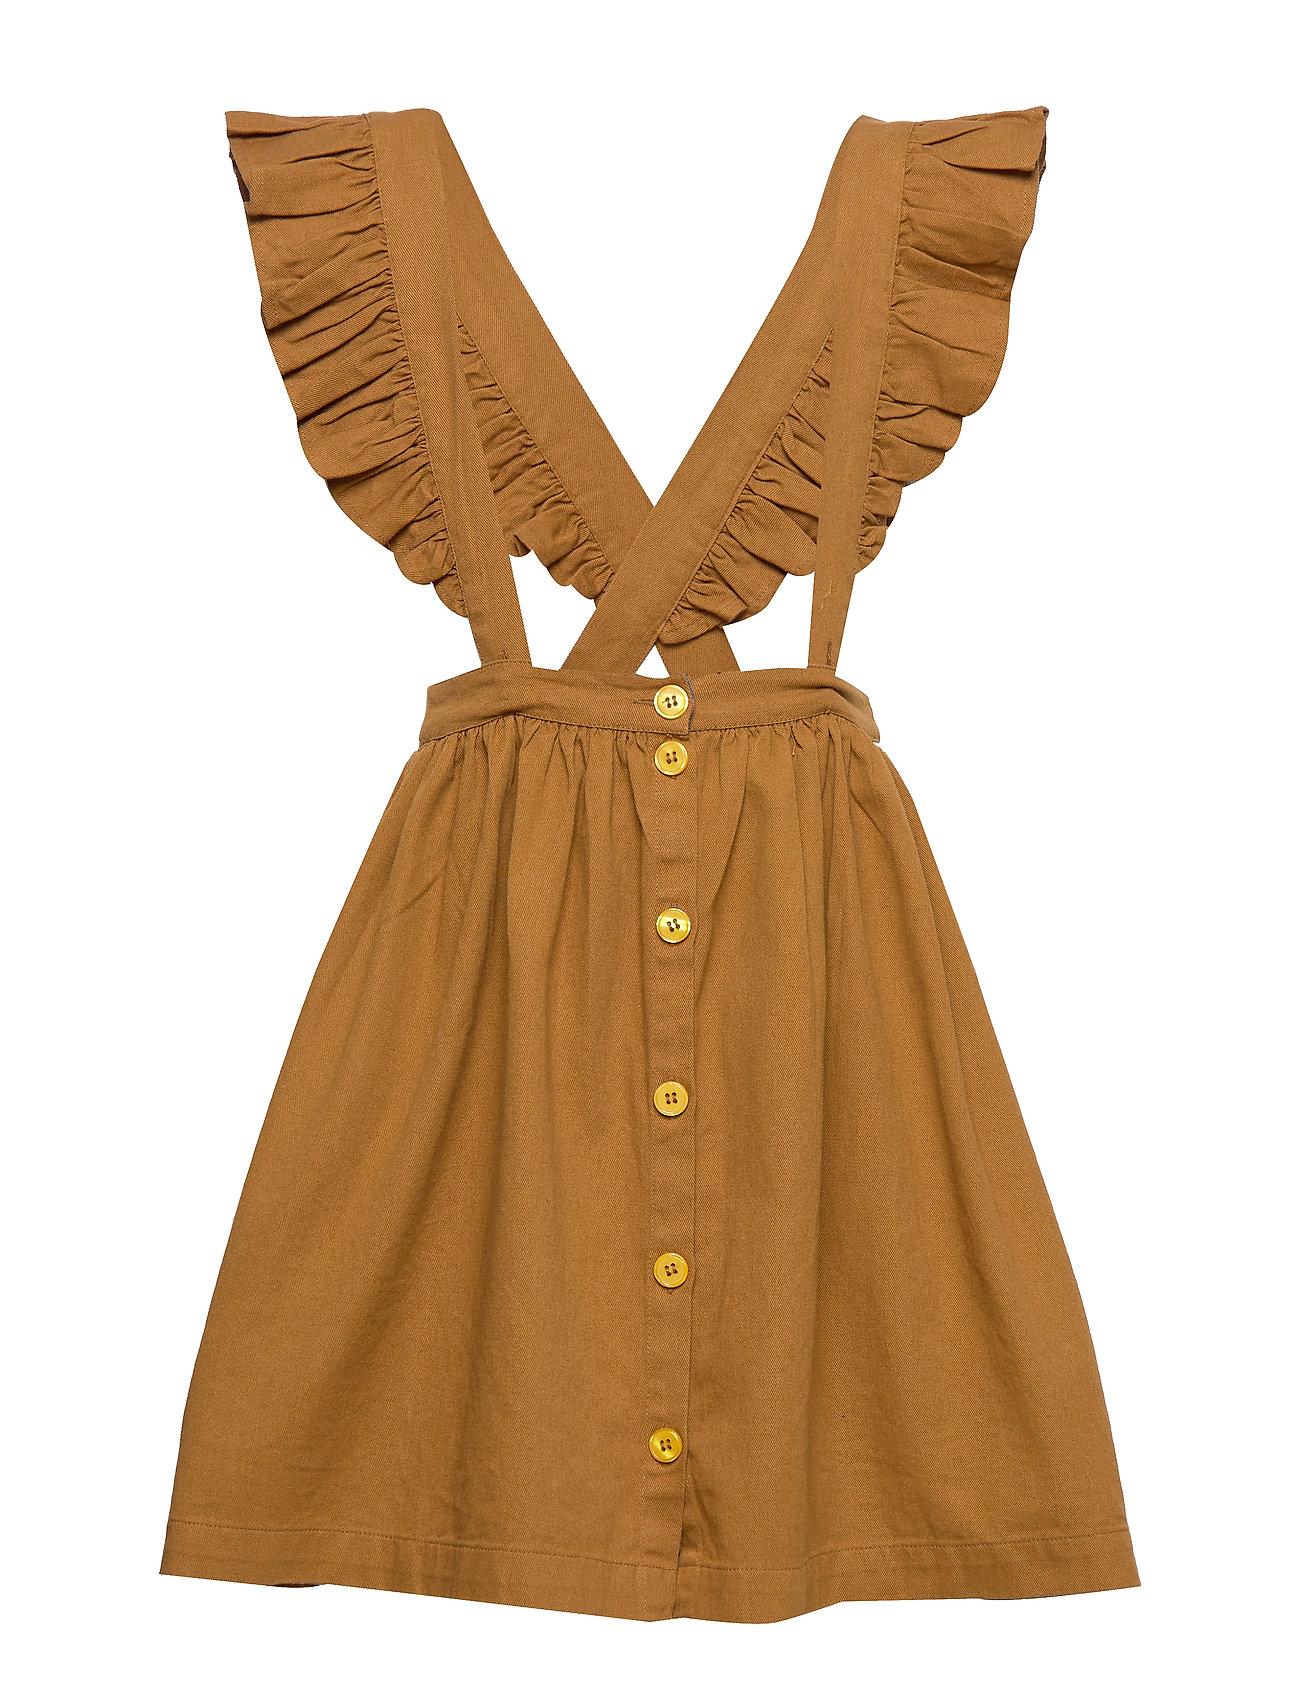 Soft Gallery Dixie Skirt - BONE BROWN